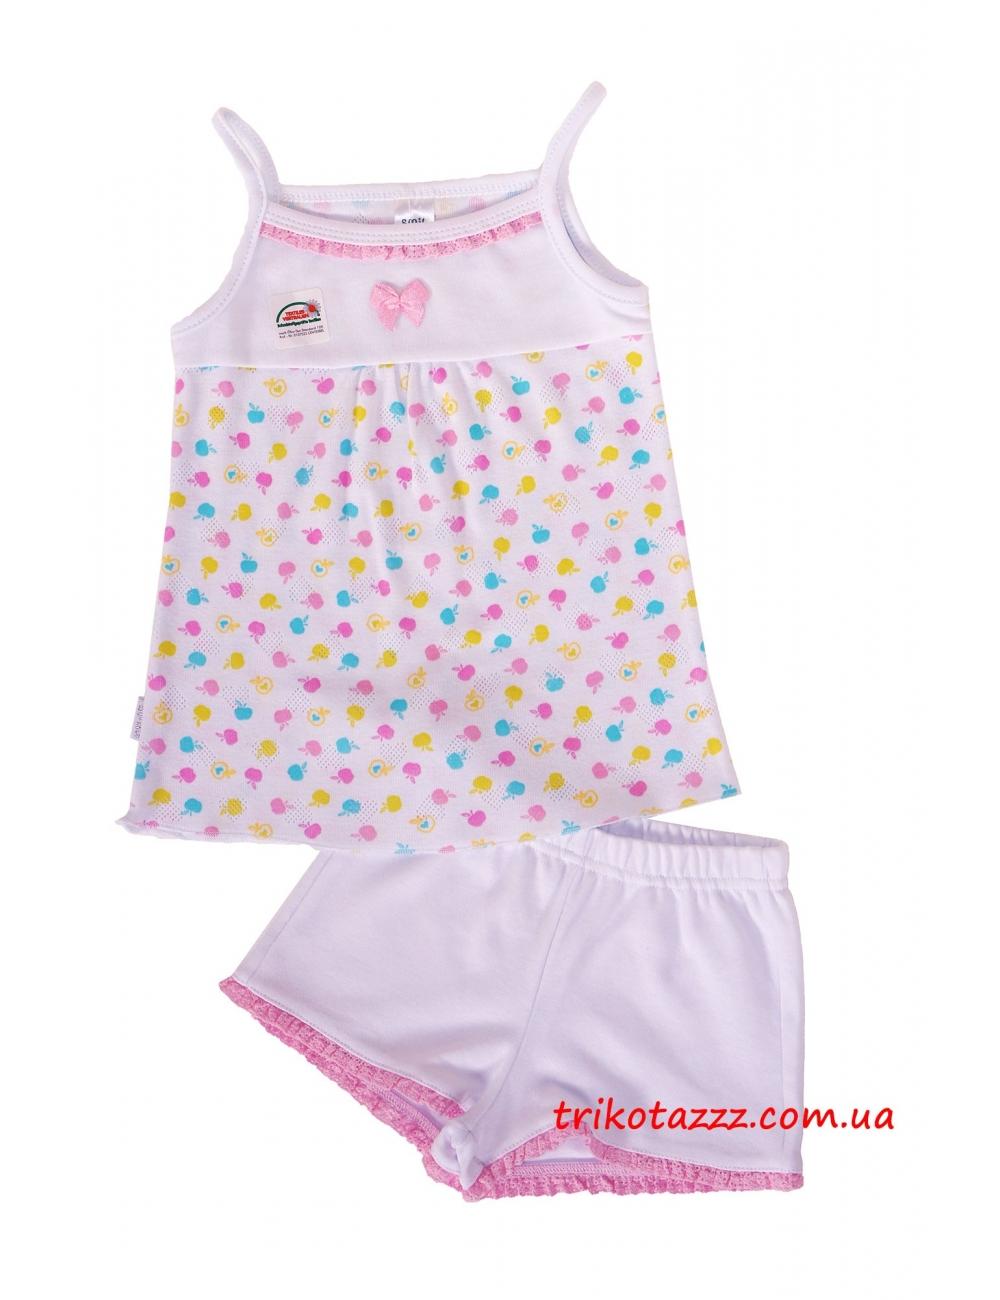 "Пижама для девочки летняя тм""Смил"" белая"